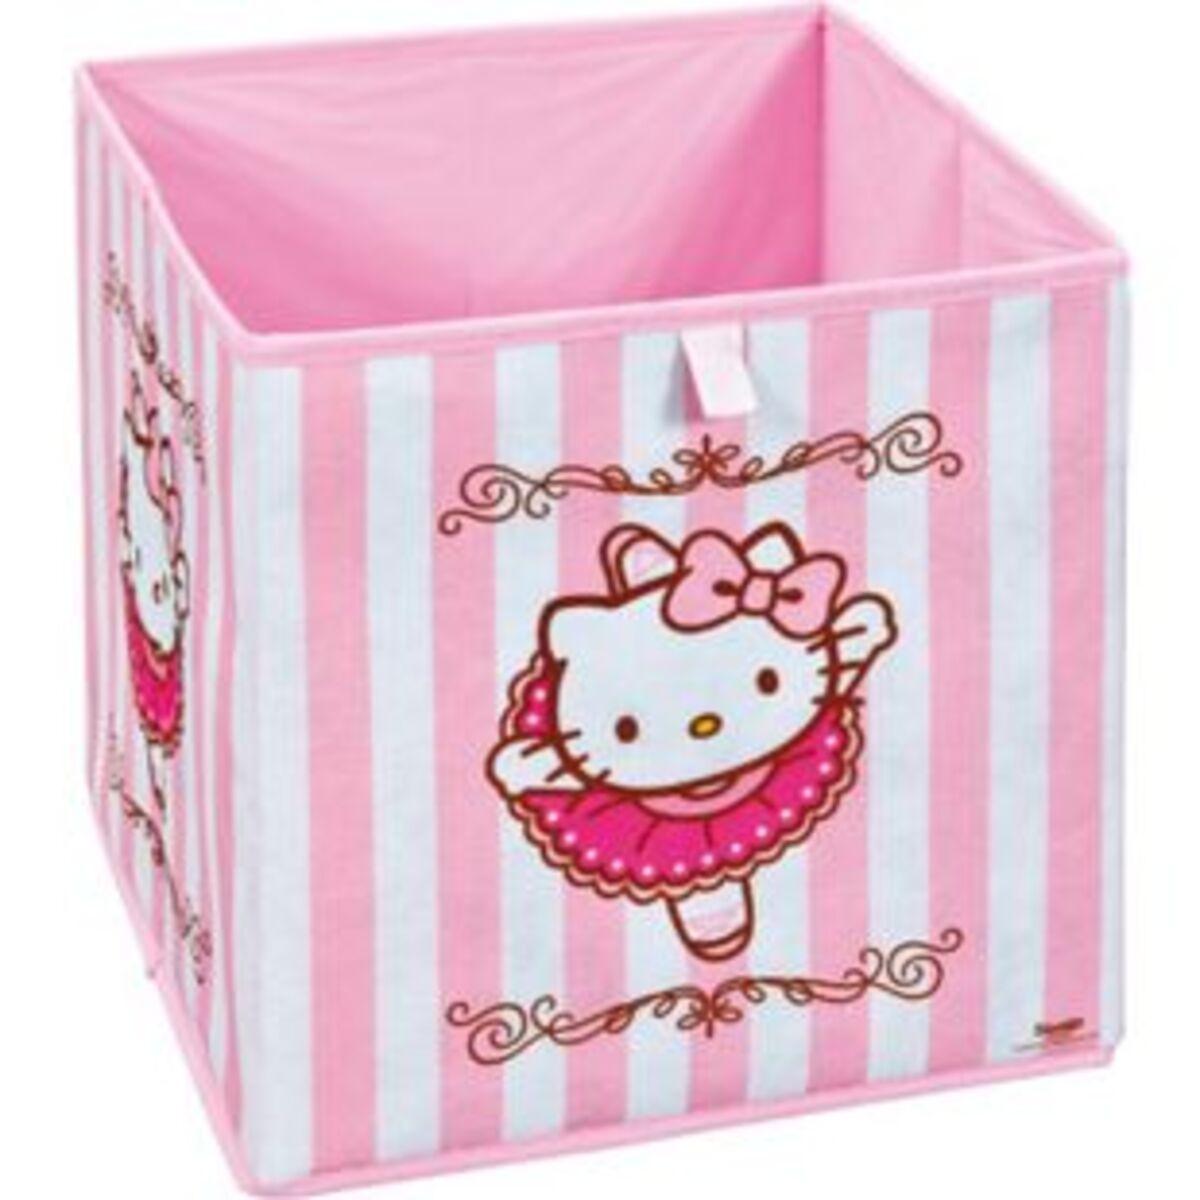 Bild 2 von Inter Link Faltkiste Hello Kitty Ballerina